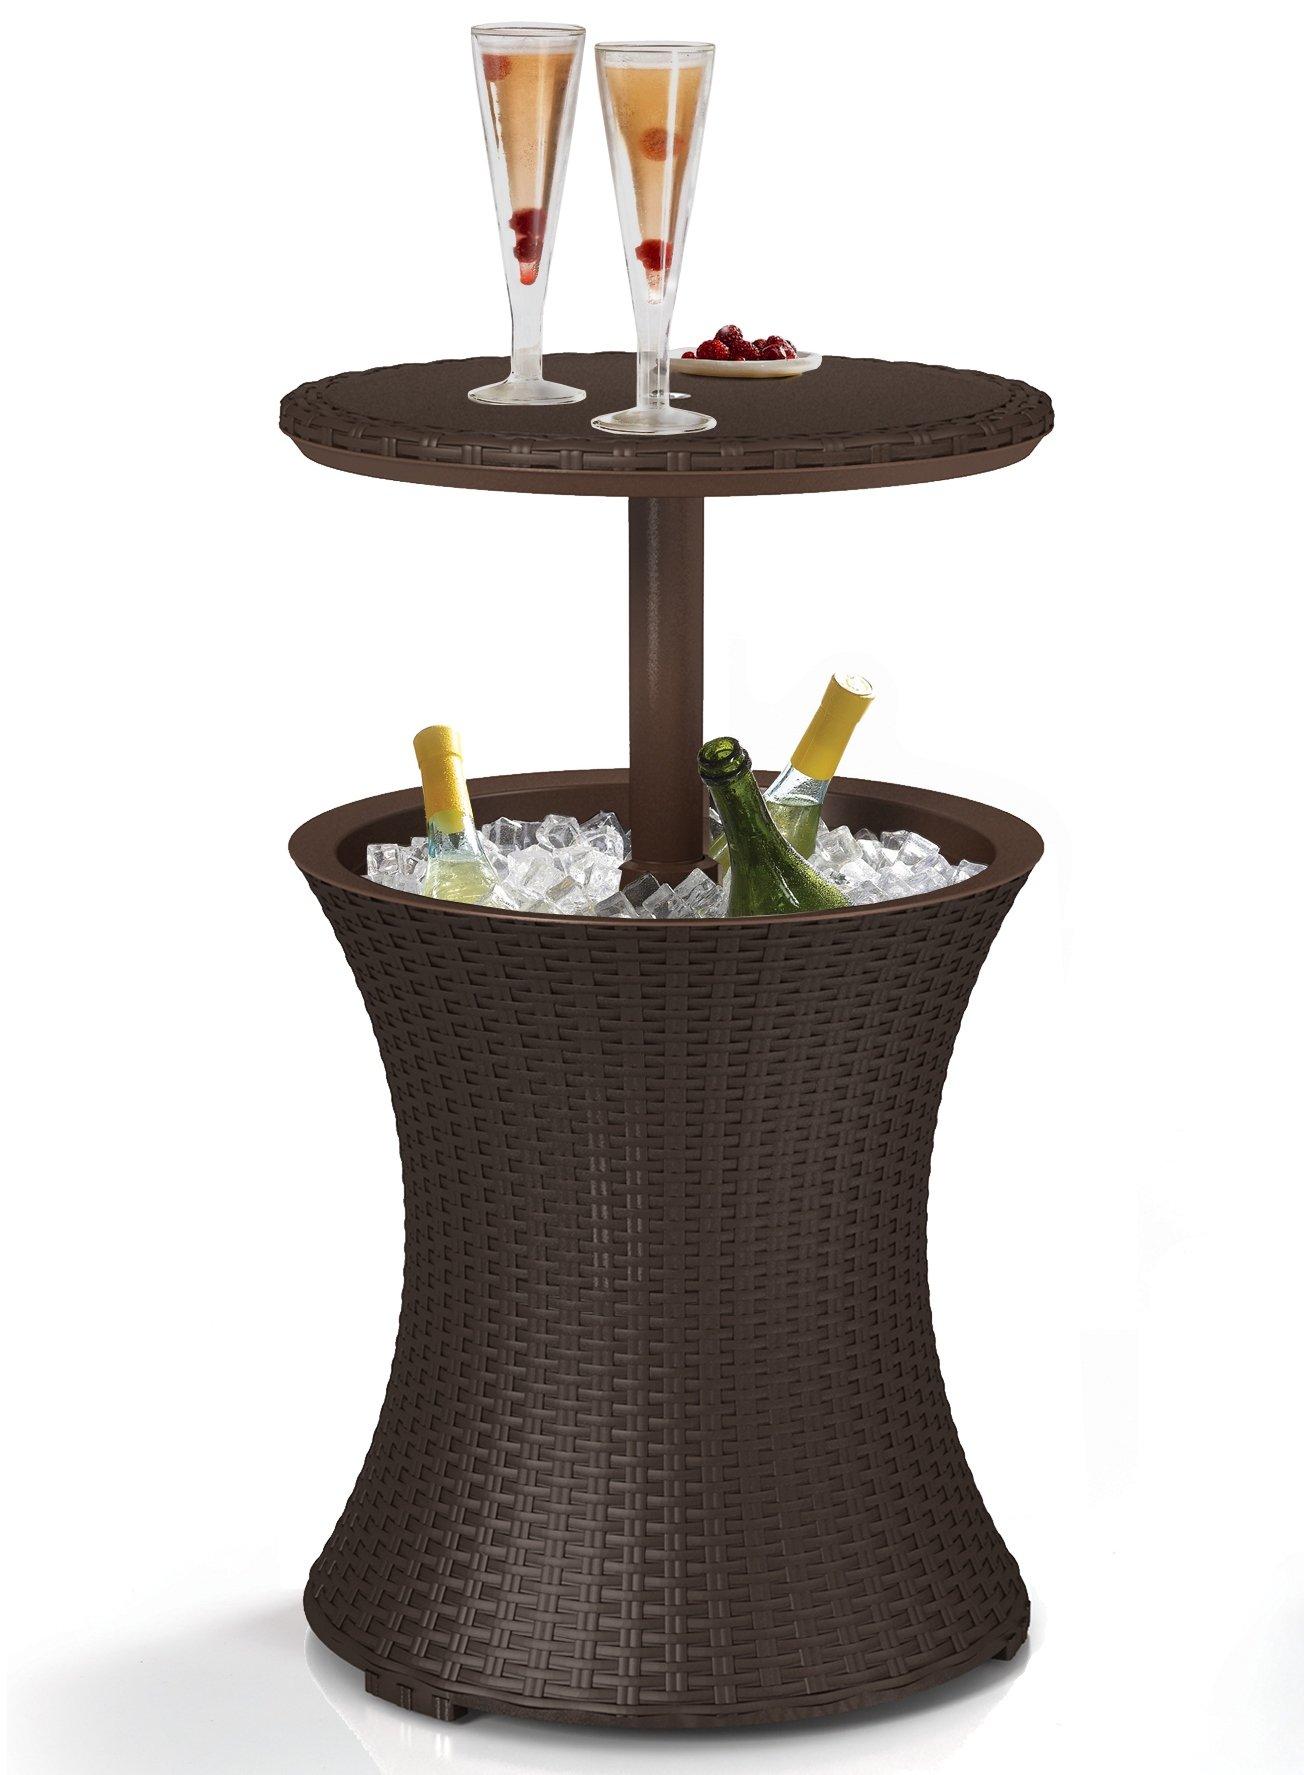 Keter Rattan Cool Bar product image